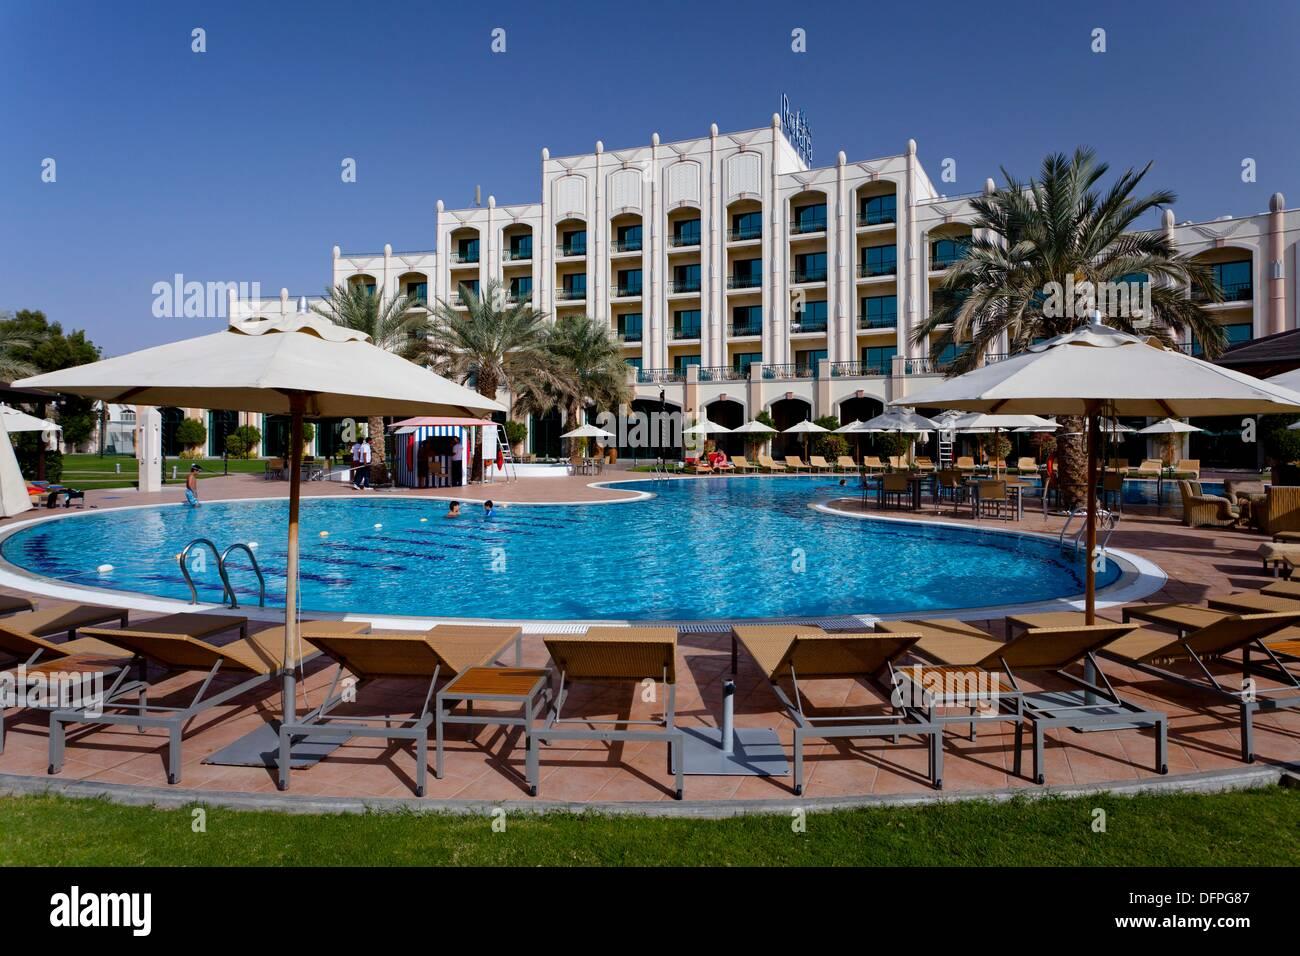 Swimming Pool Area Of The Rotana Resort Hotel In Al Ain Abu Dhabi Stock Photo Royalty Free